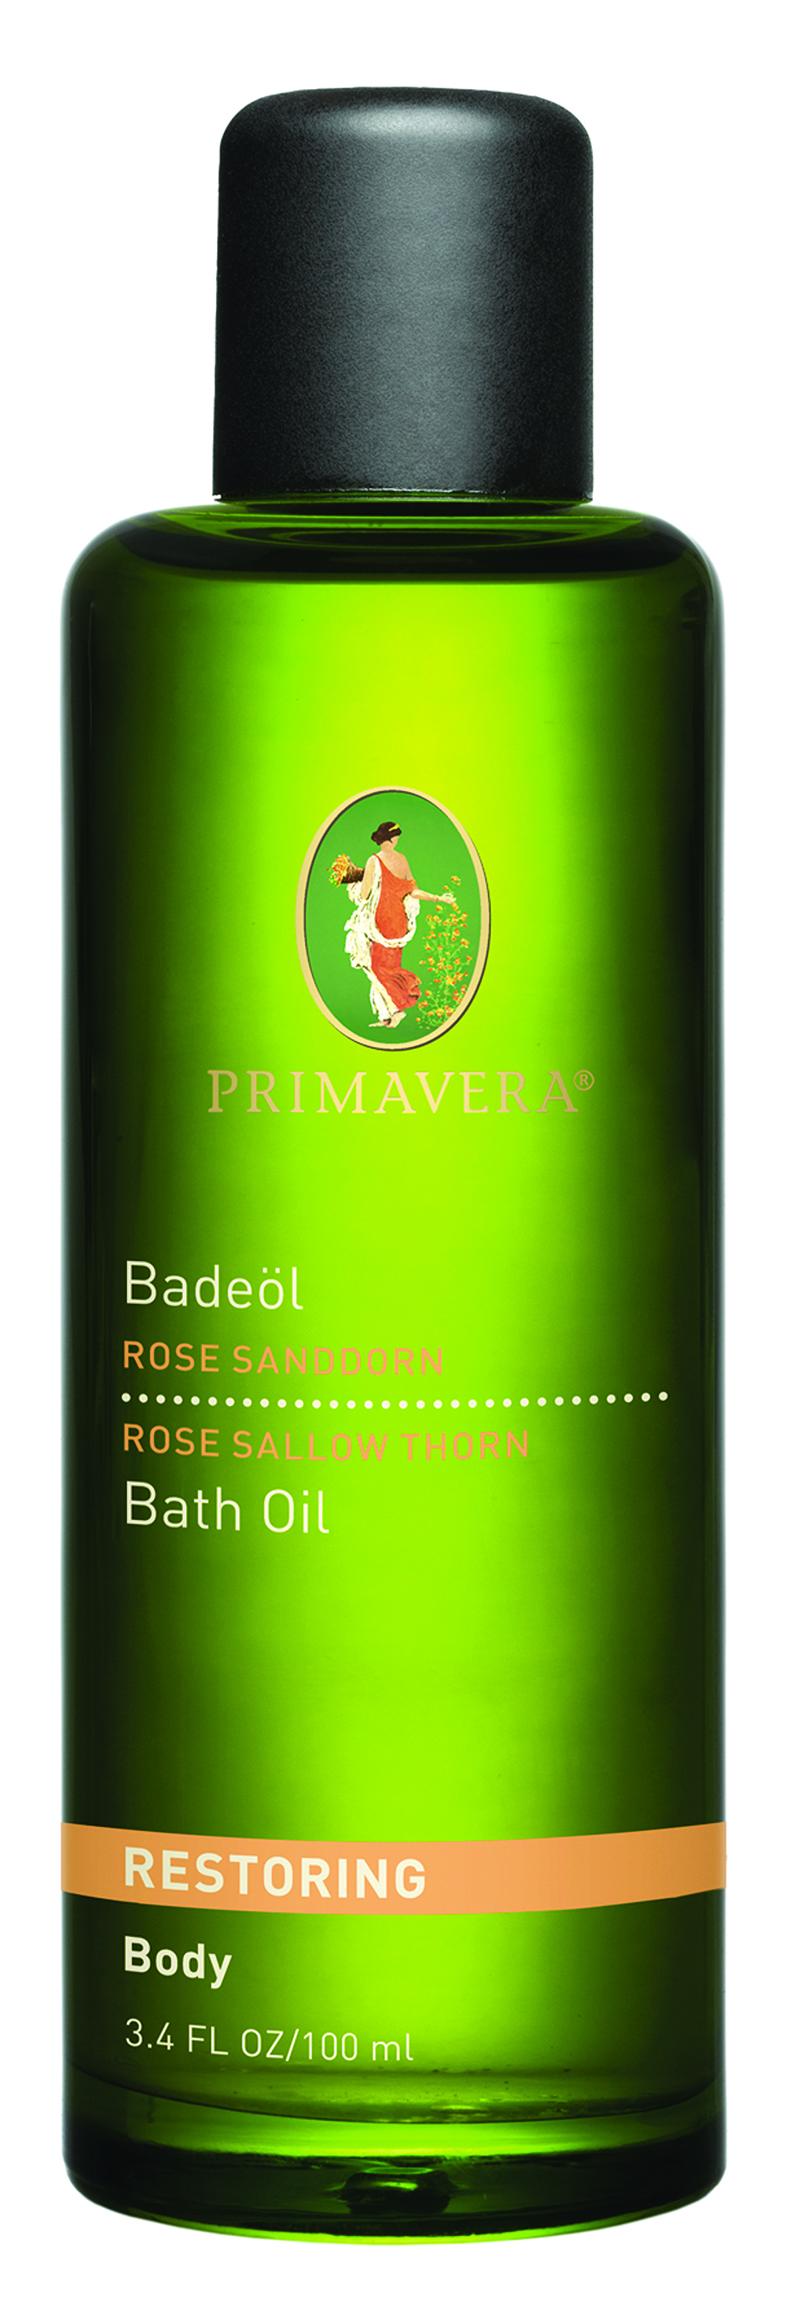 Primavera Restoring Bath Oil